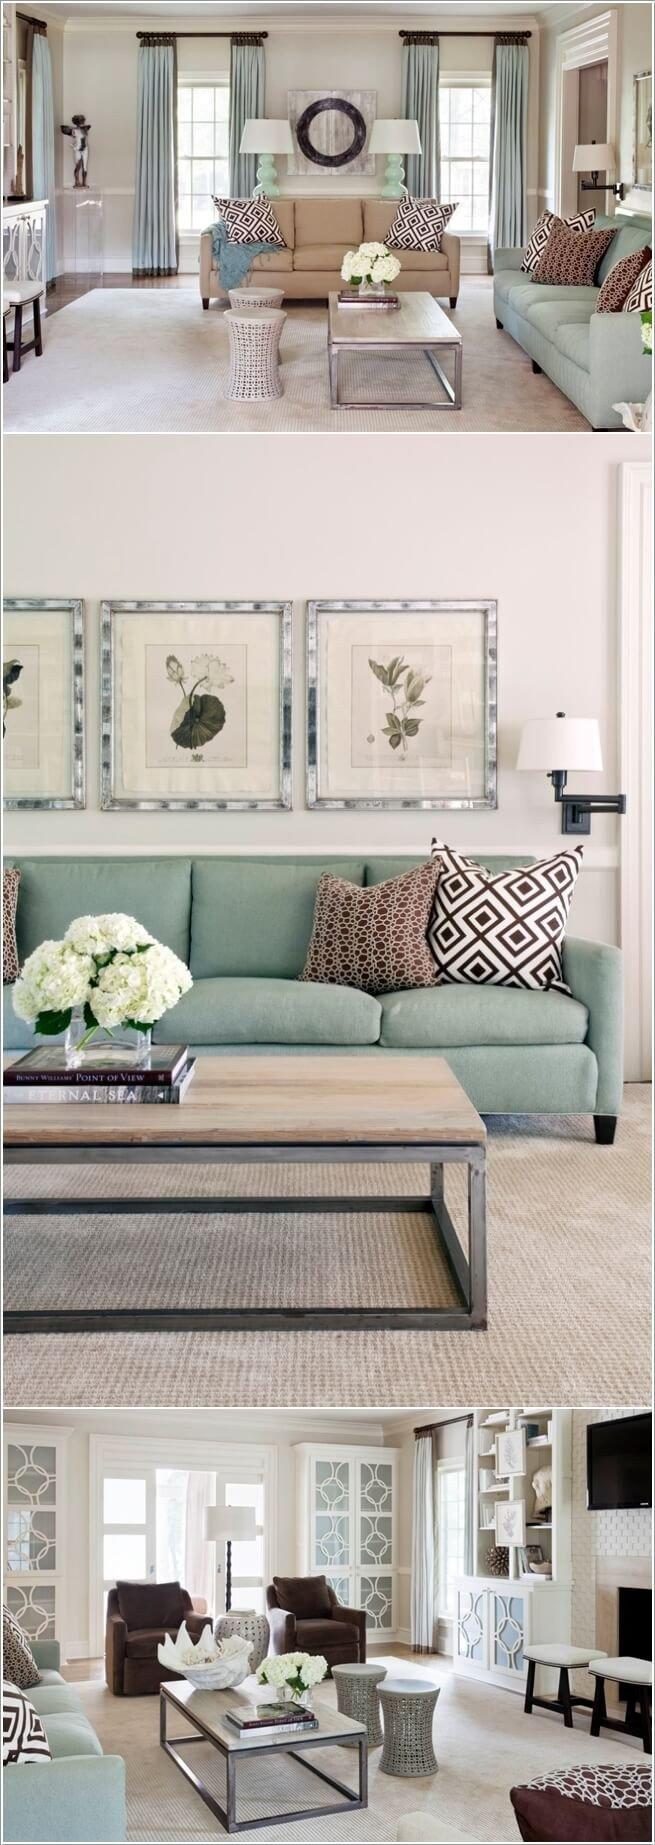 Ideas for Living Room Decor Elegant 10 Nature Inspired Living Room Decor Ideas